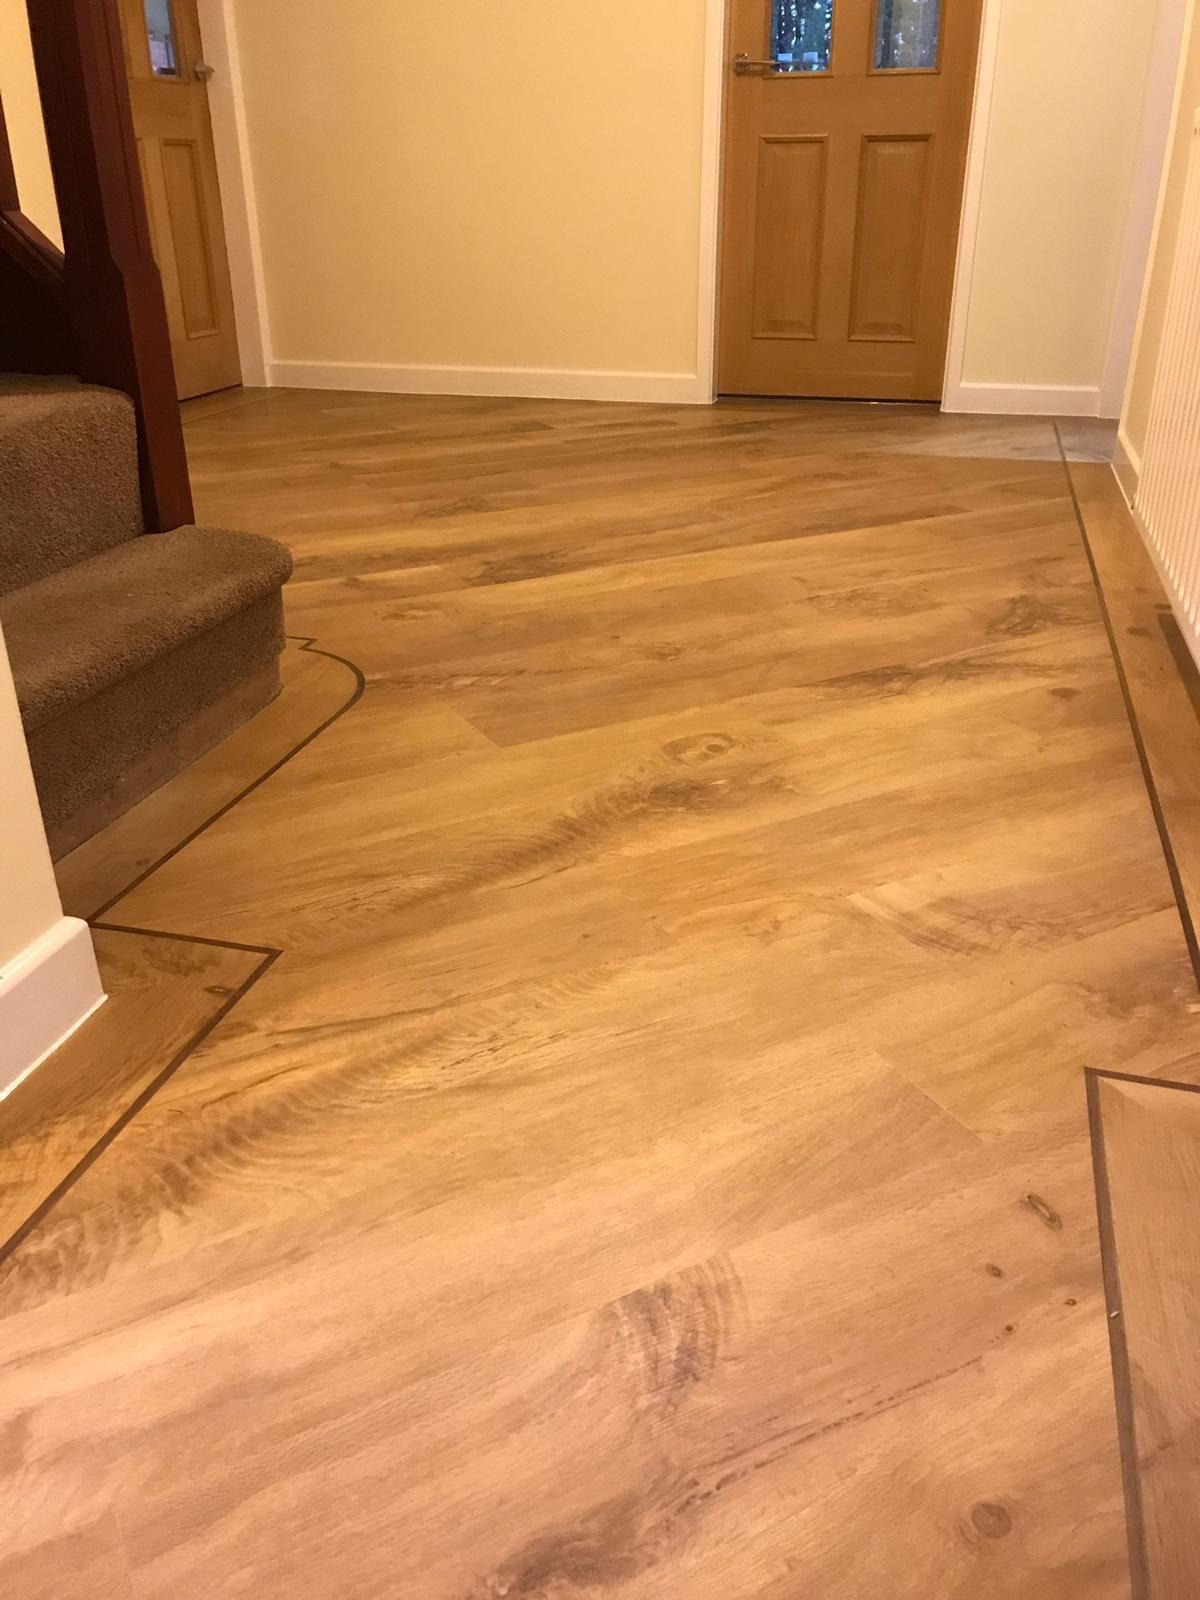 Karndean Oak Flooring Midland Carpets And Flooring